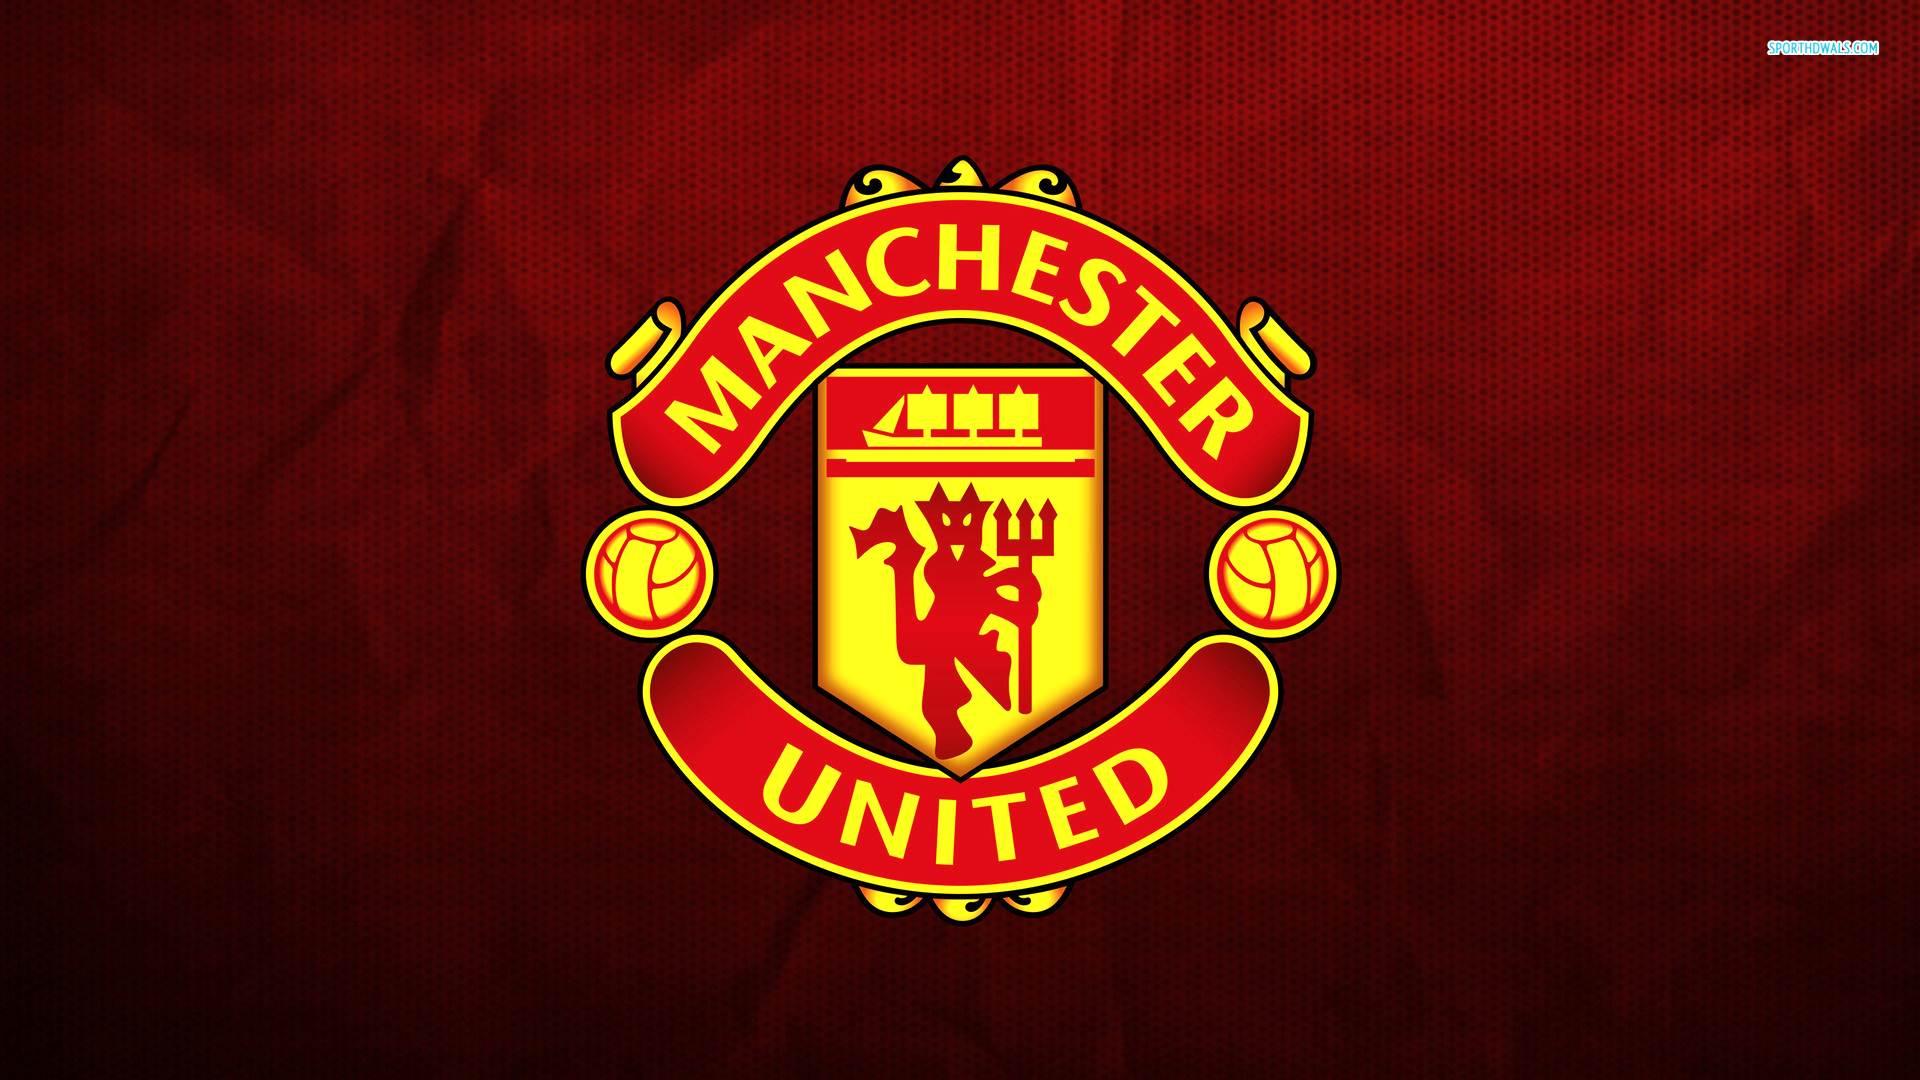 Manchester United Desktop Wallpaper Wallpapersafari